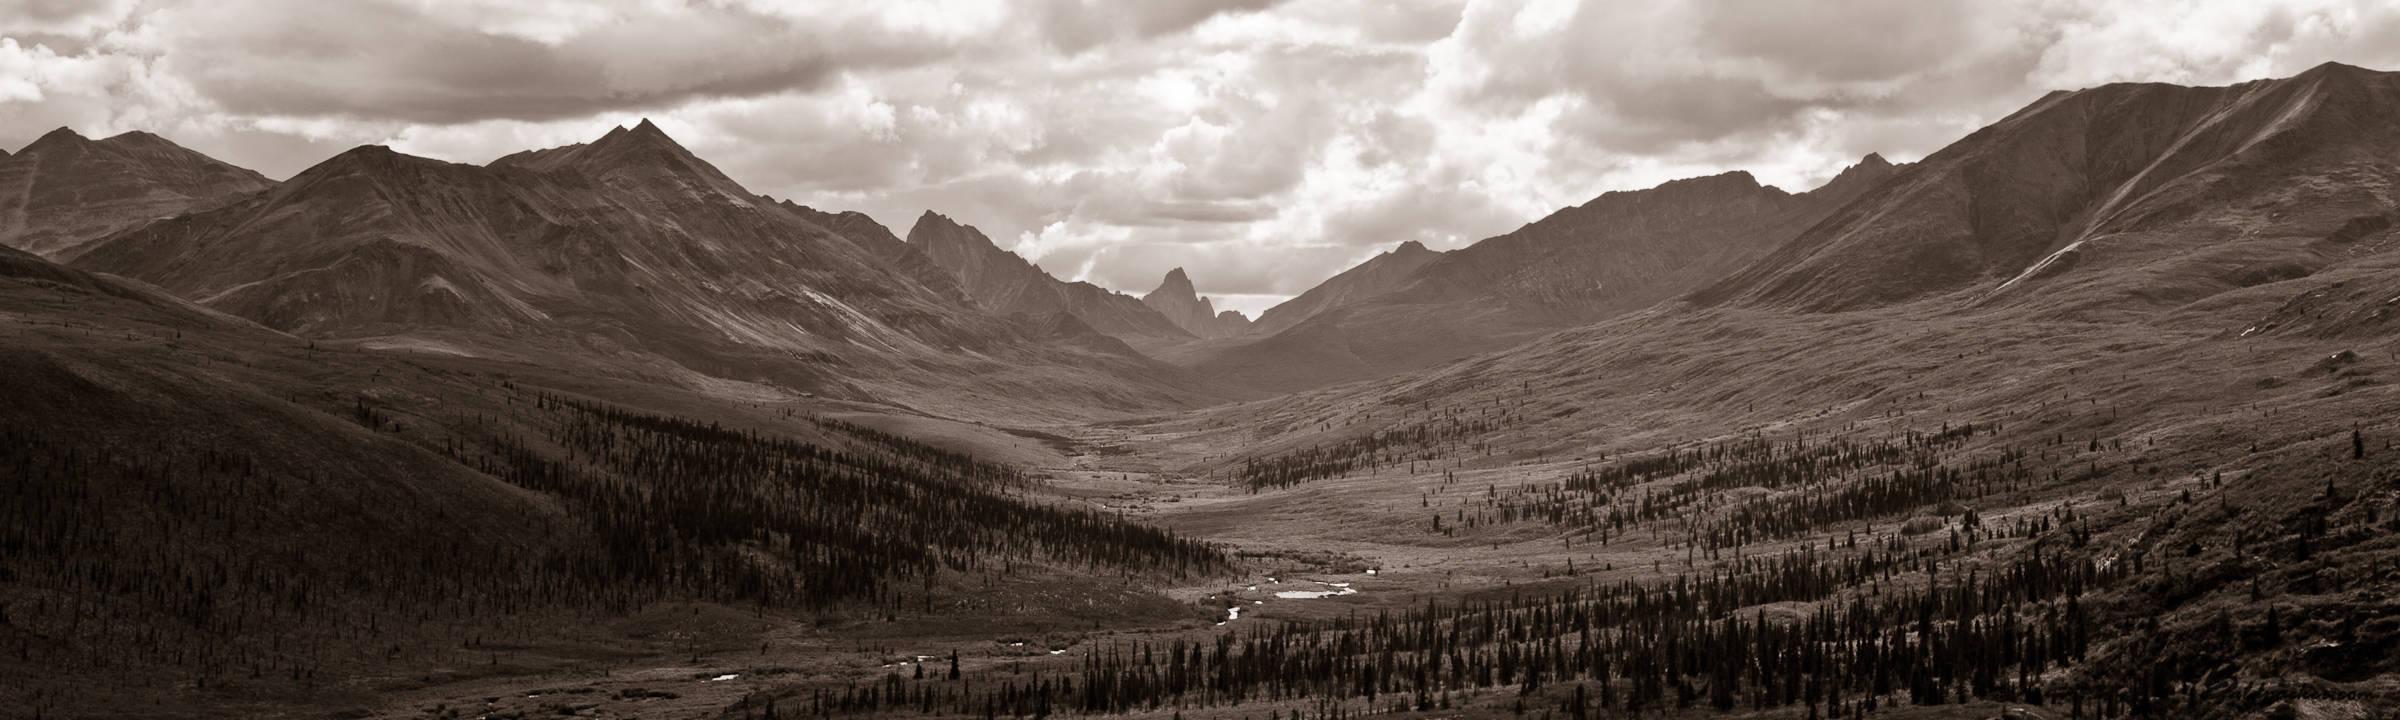 7665km Canadian Arctic Road Trip: Yukon & Dempster Highway